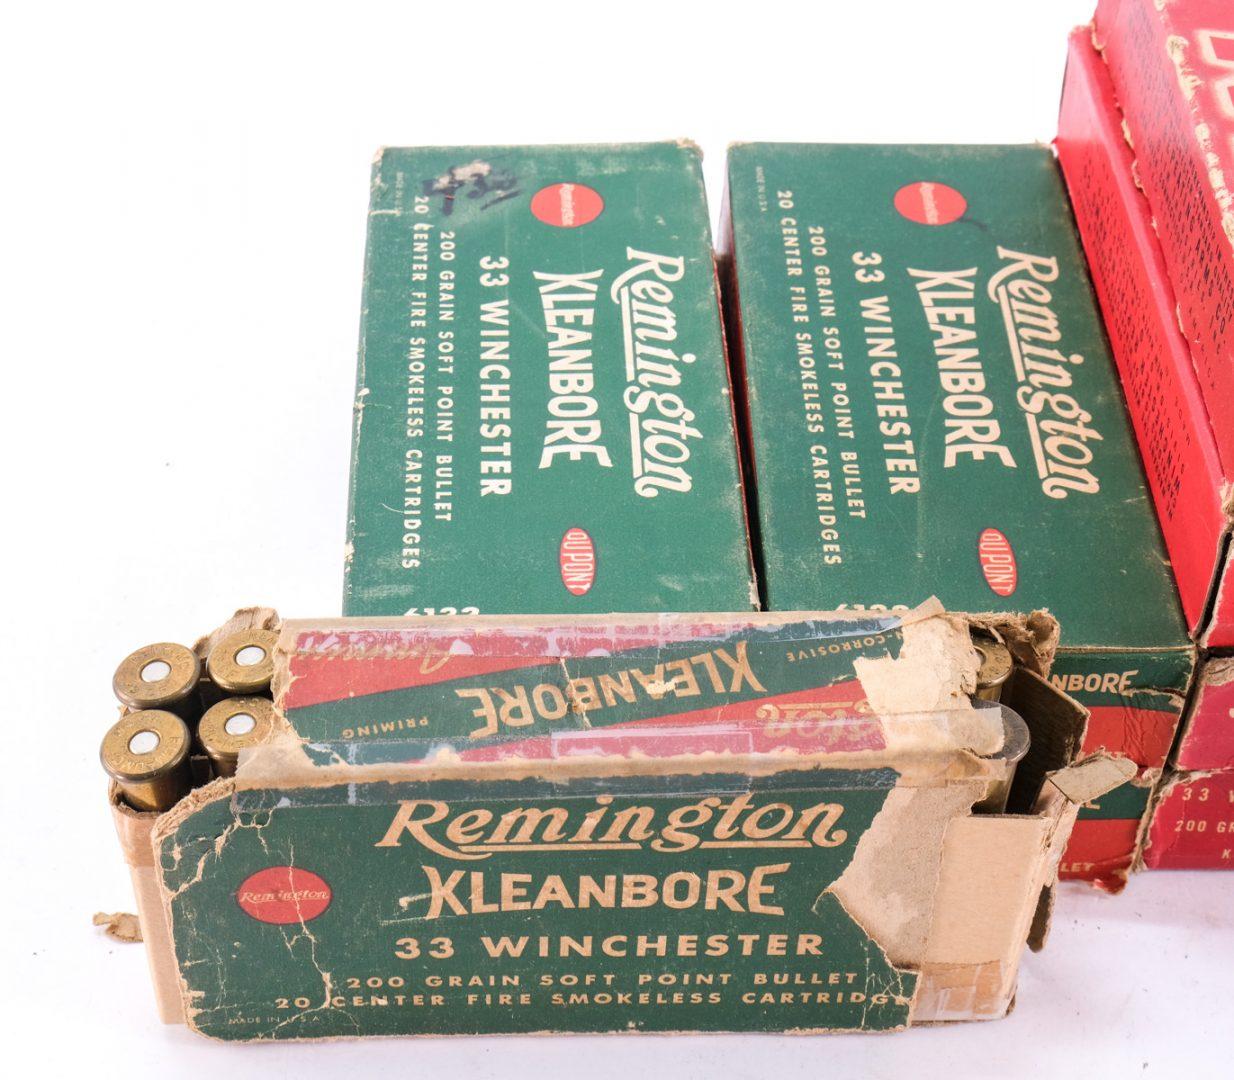 .33 WIN Ammunition 180Rds